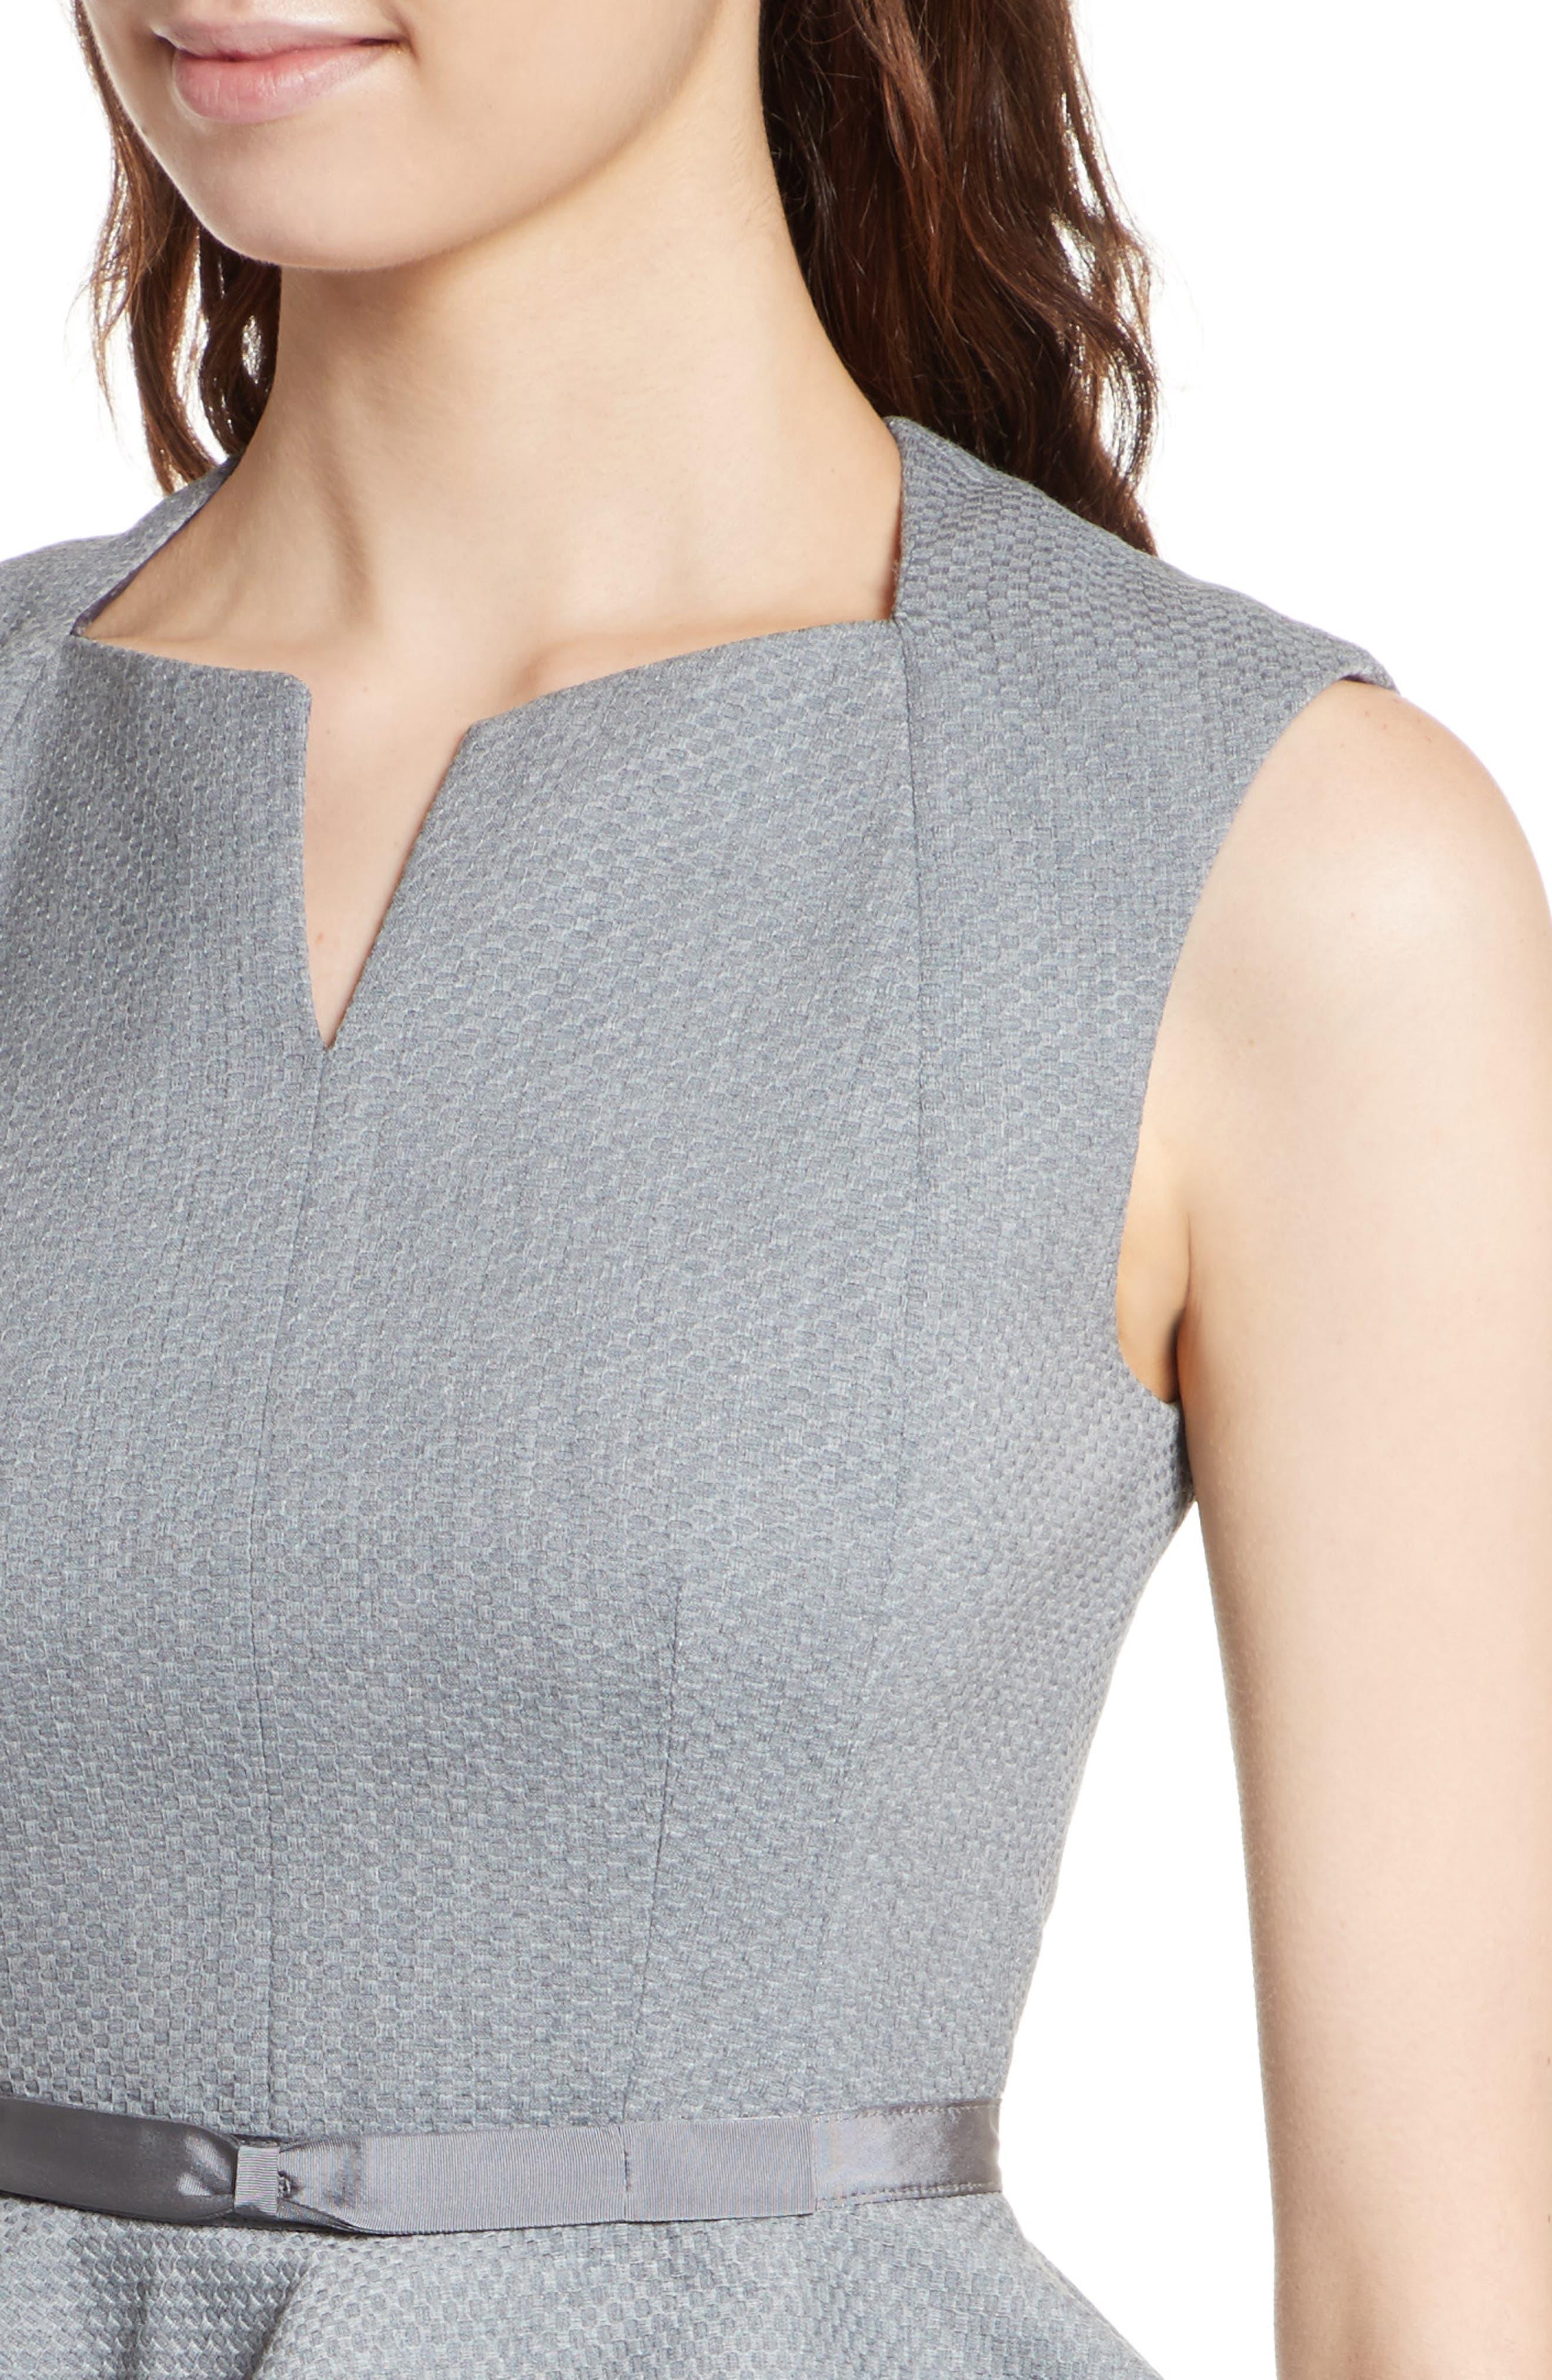 Nadaed Bow Detail Textured Peplum Dress,                             Alternate thumbnail 4, color,                             Mid Grey